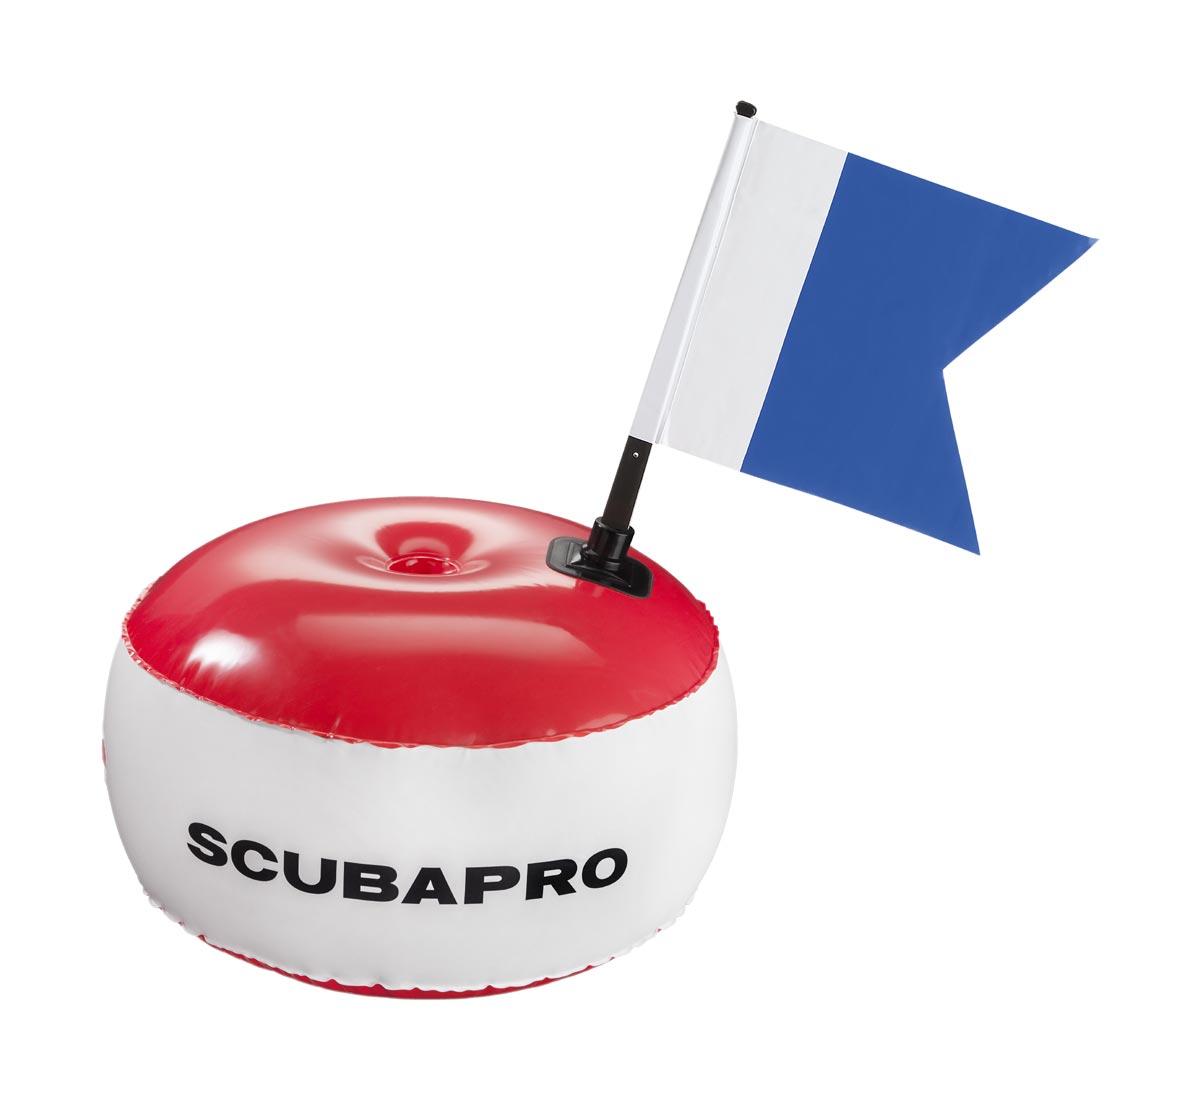 SCUBAPRO - Signalboje rund mit Alpha Flagge